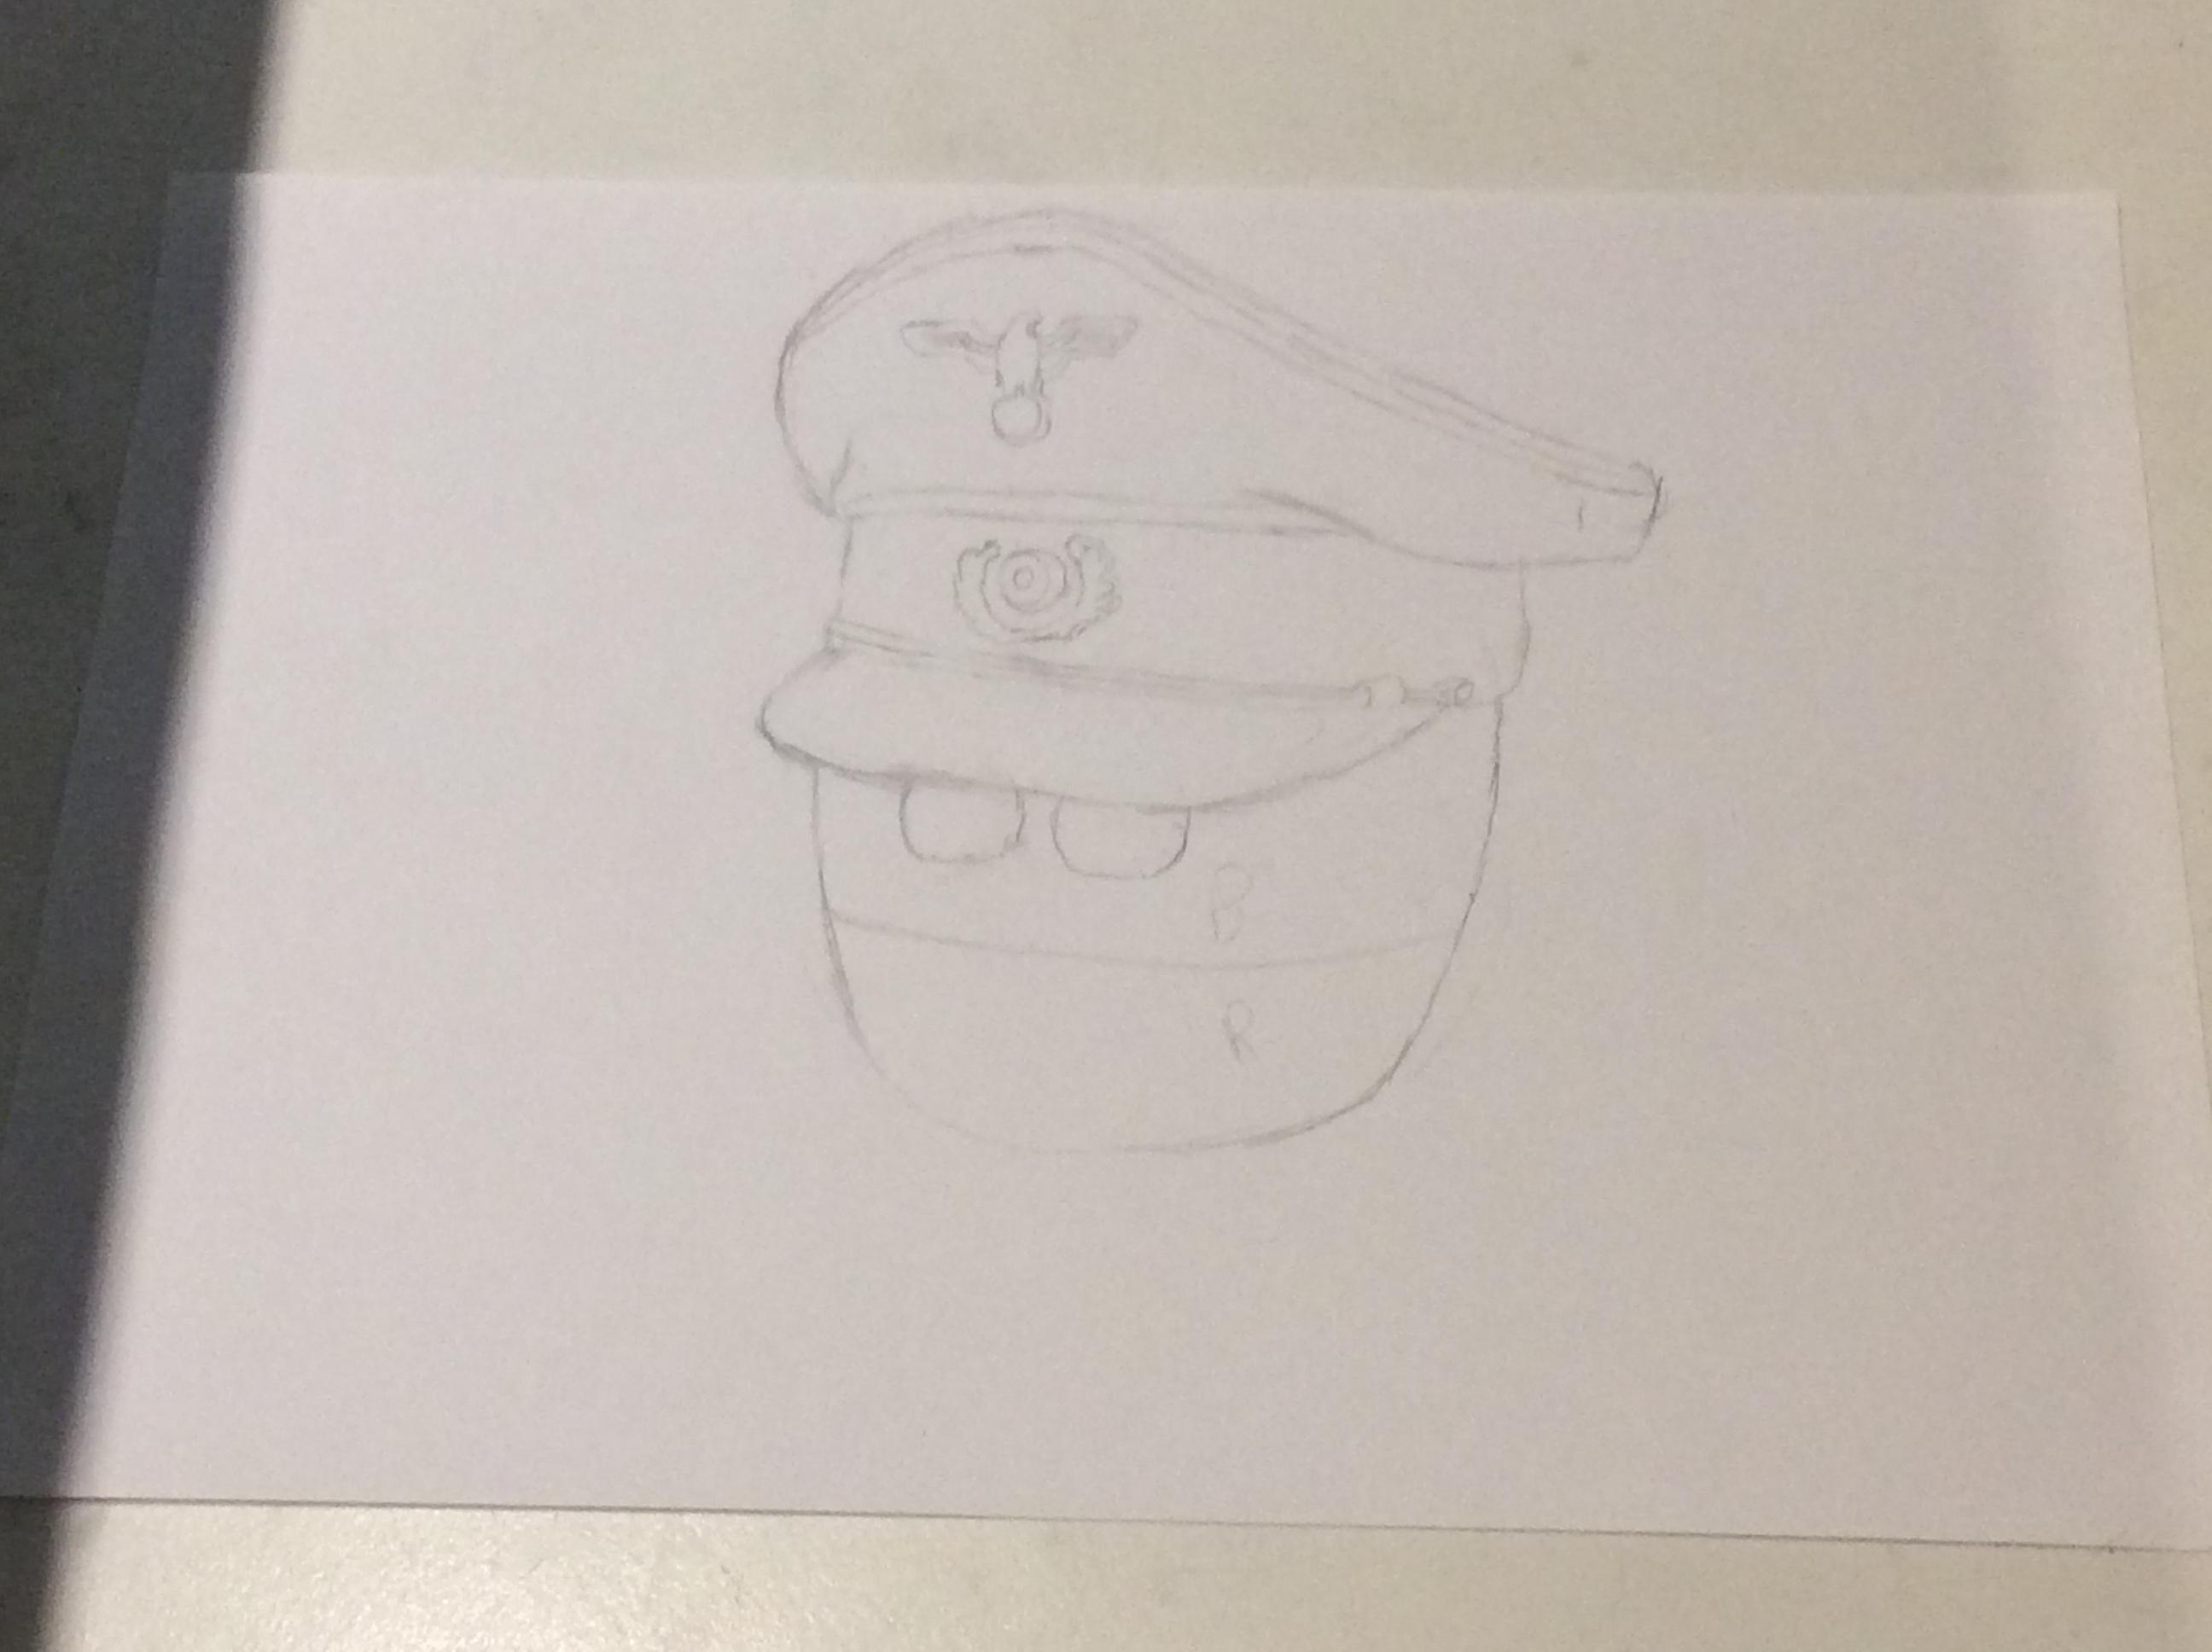 AkkoKun/Sketch of Rommelball